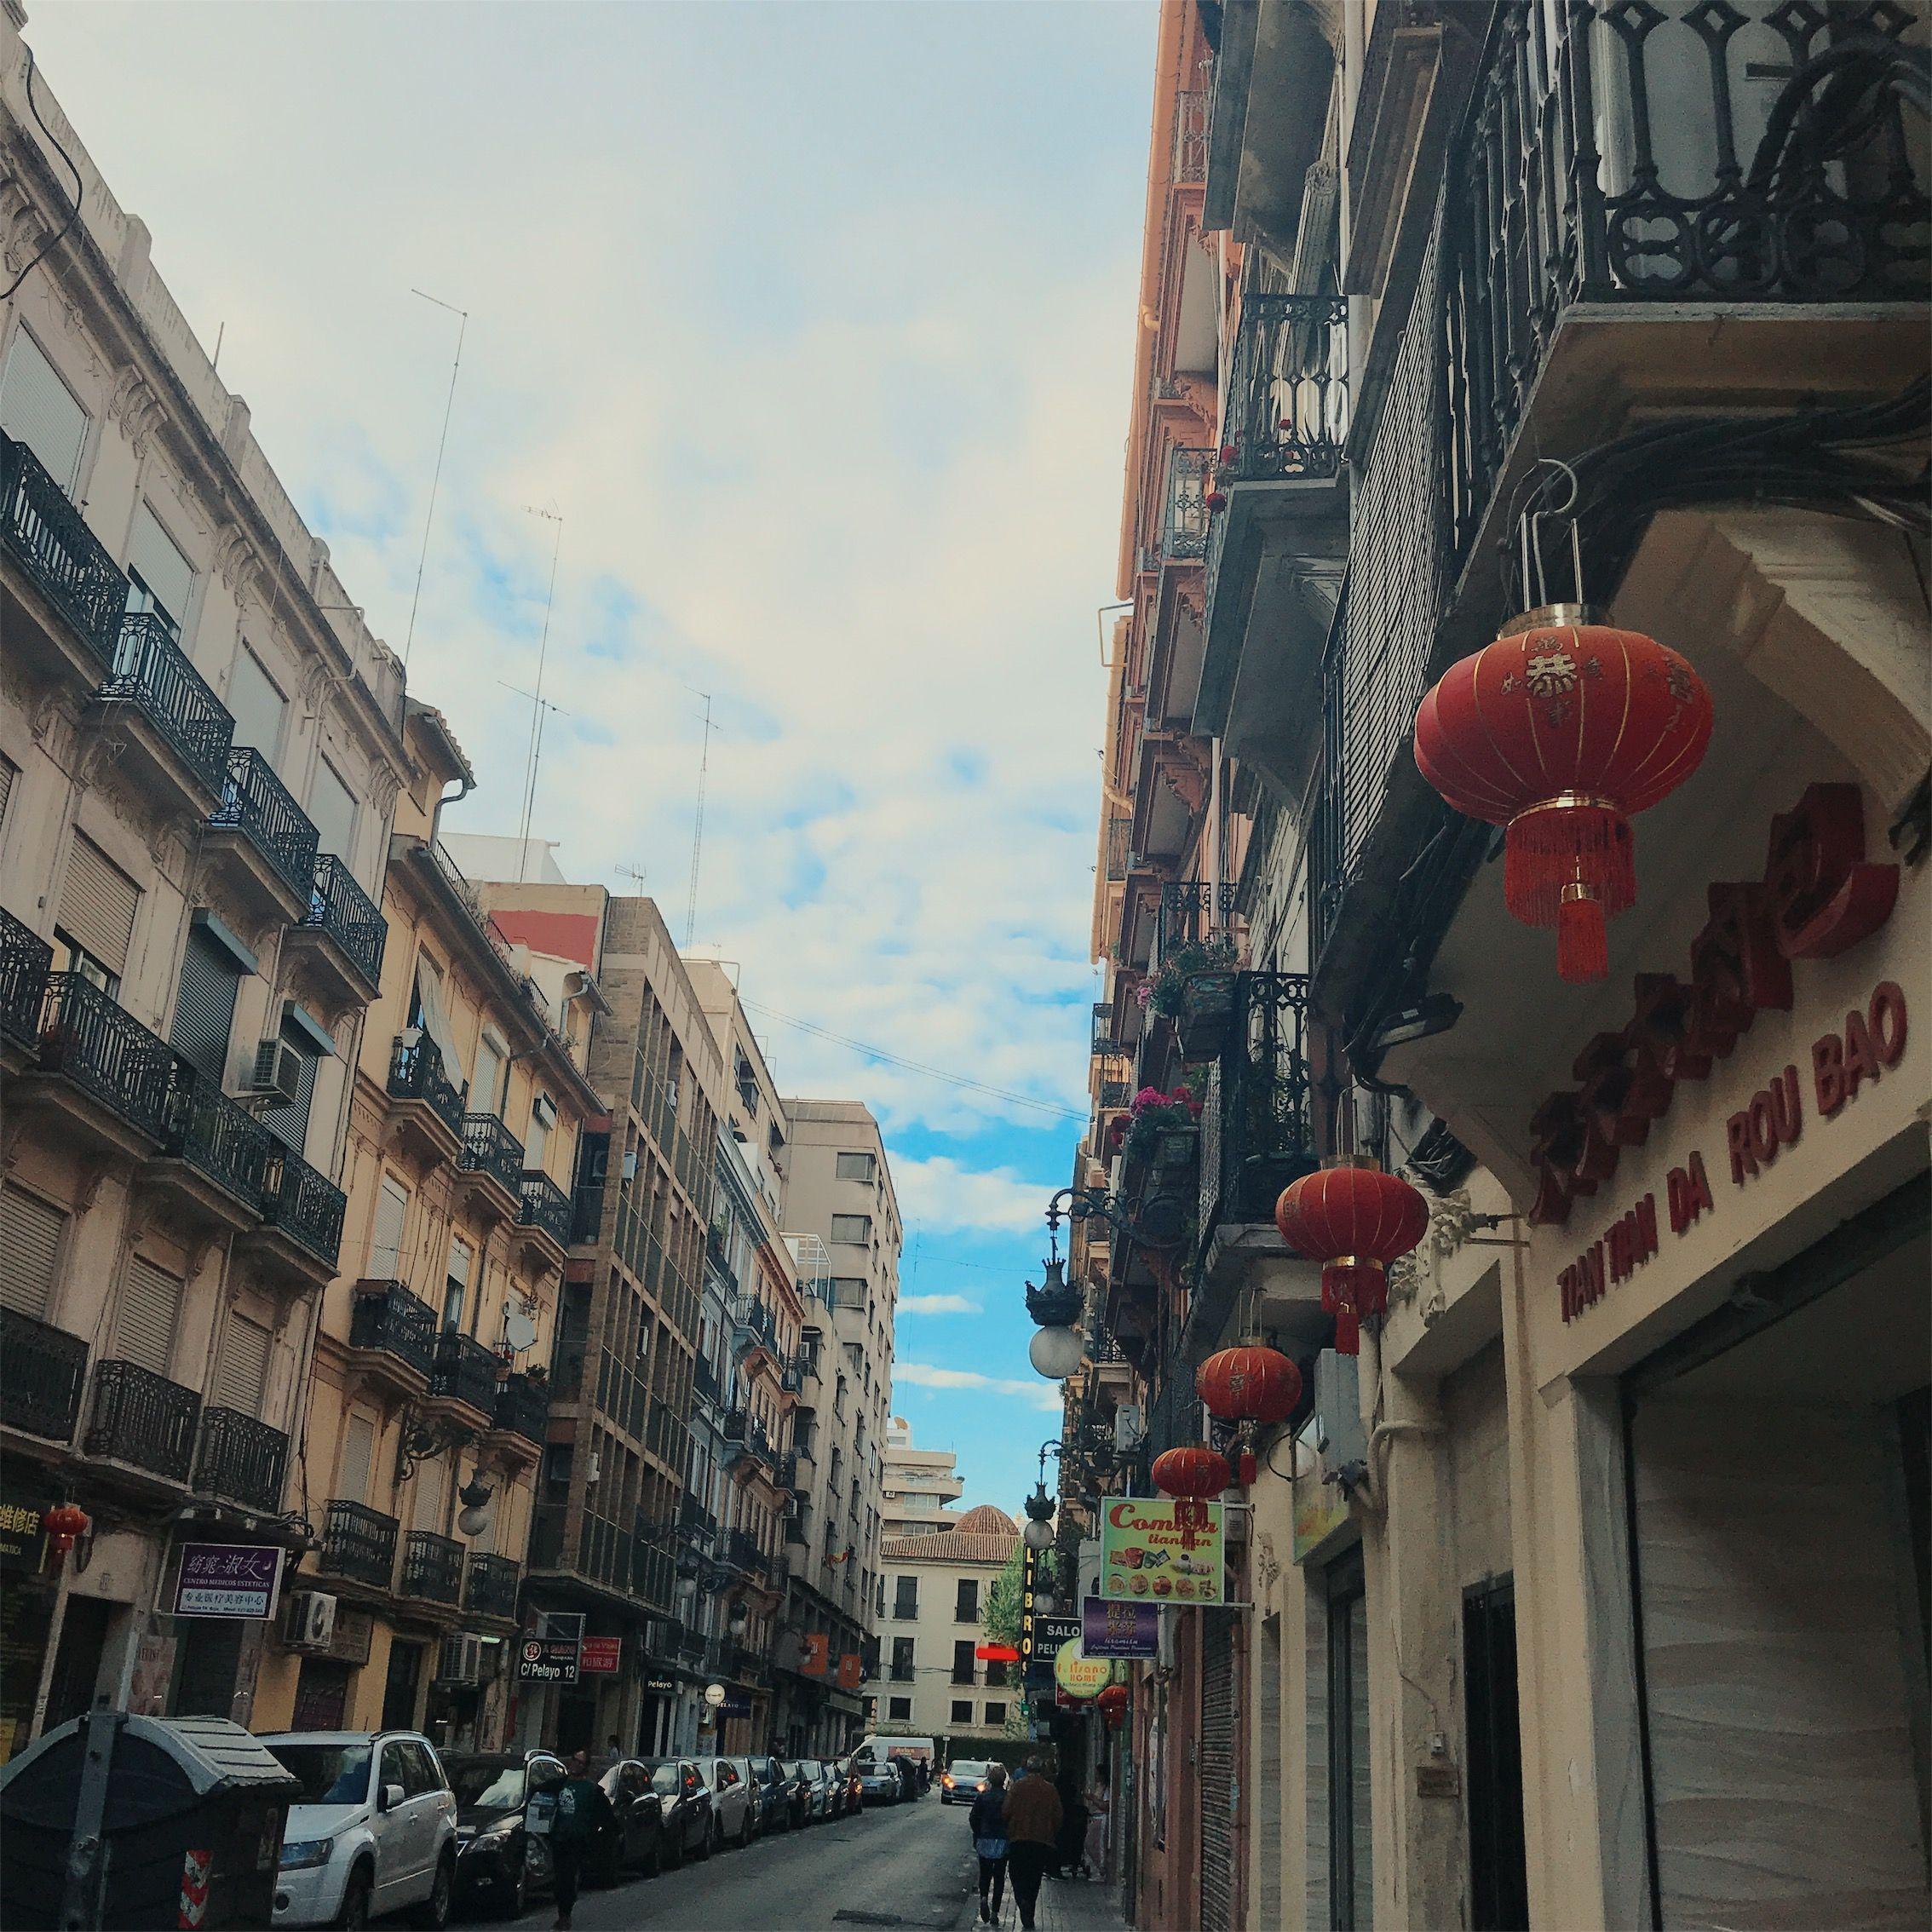 Calle Pelayo/China Town Valencia